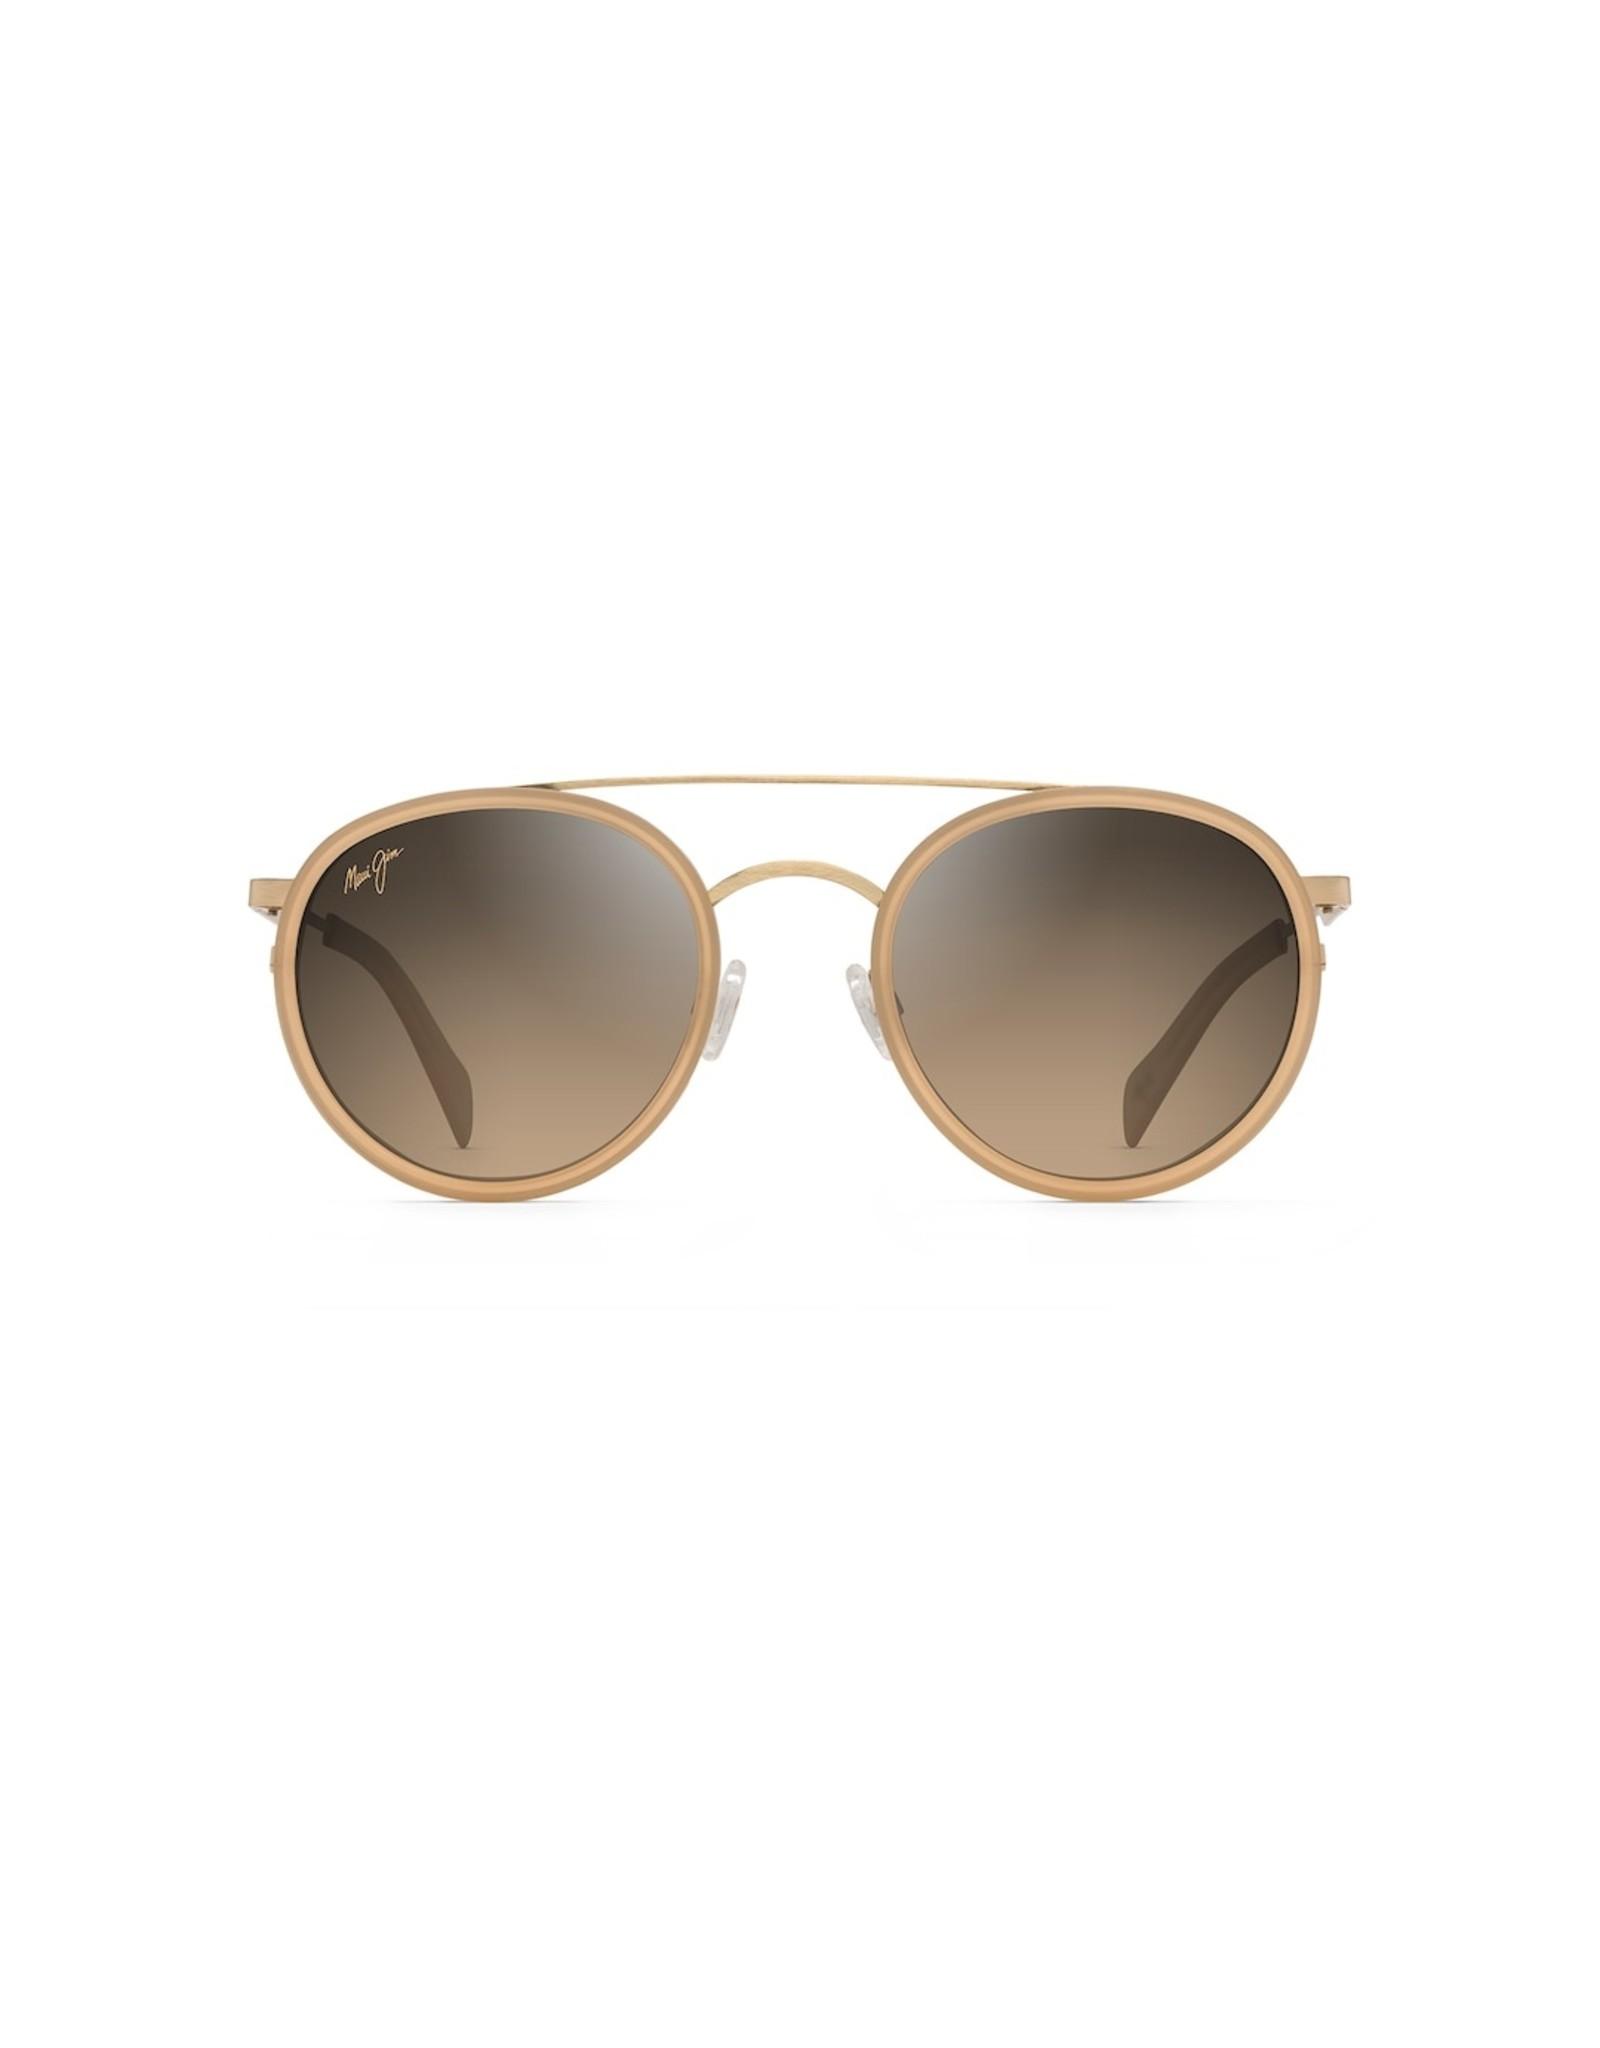 Maui Jim Maui Jim 'Even Keel' Sunglasses